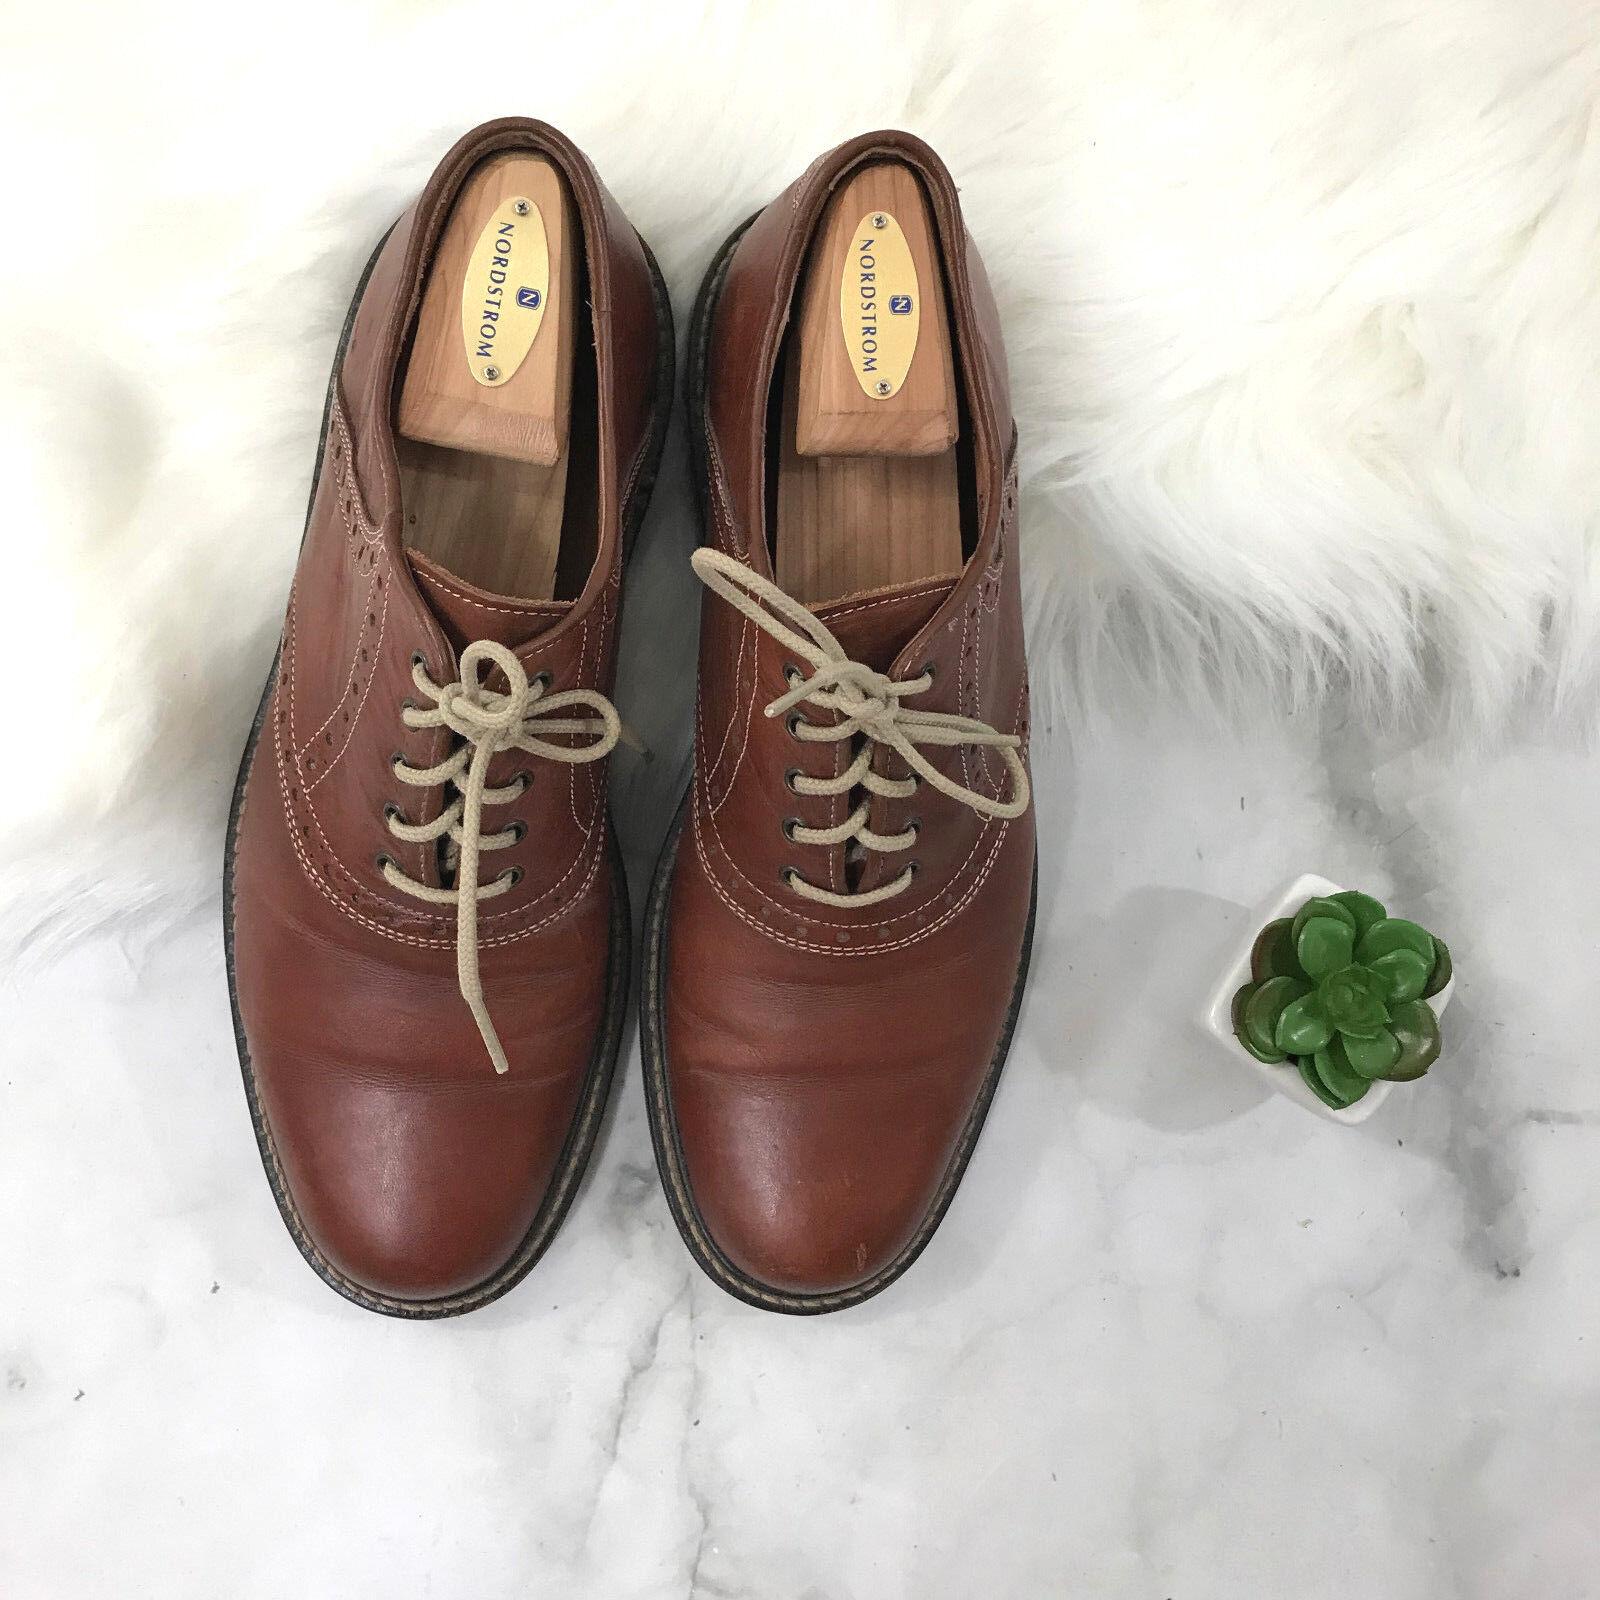 Men's Chestnut Brown Johnston & Murphy Derby Oxford shoes Office Work shoes Sz. 9